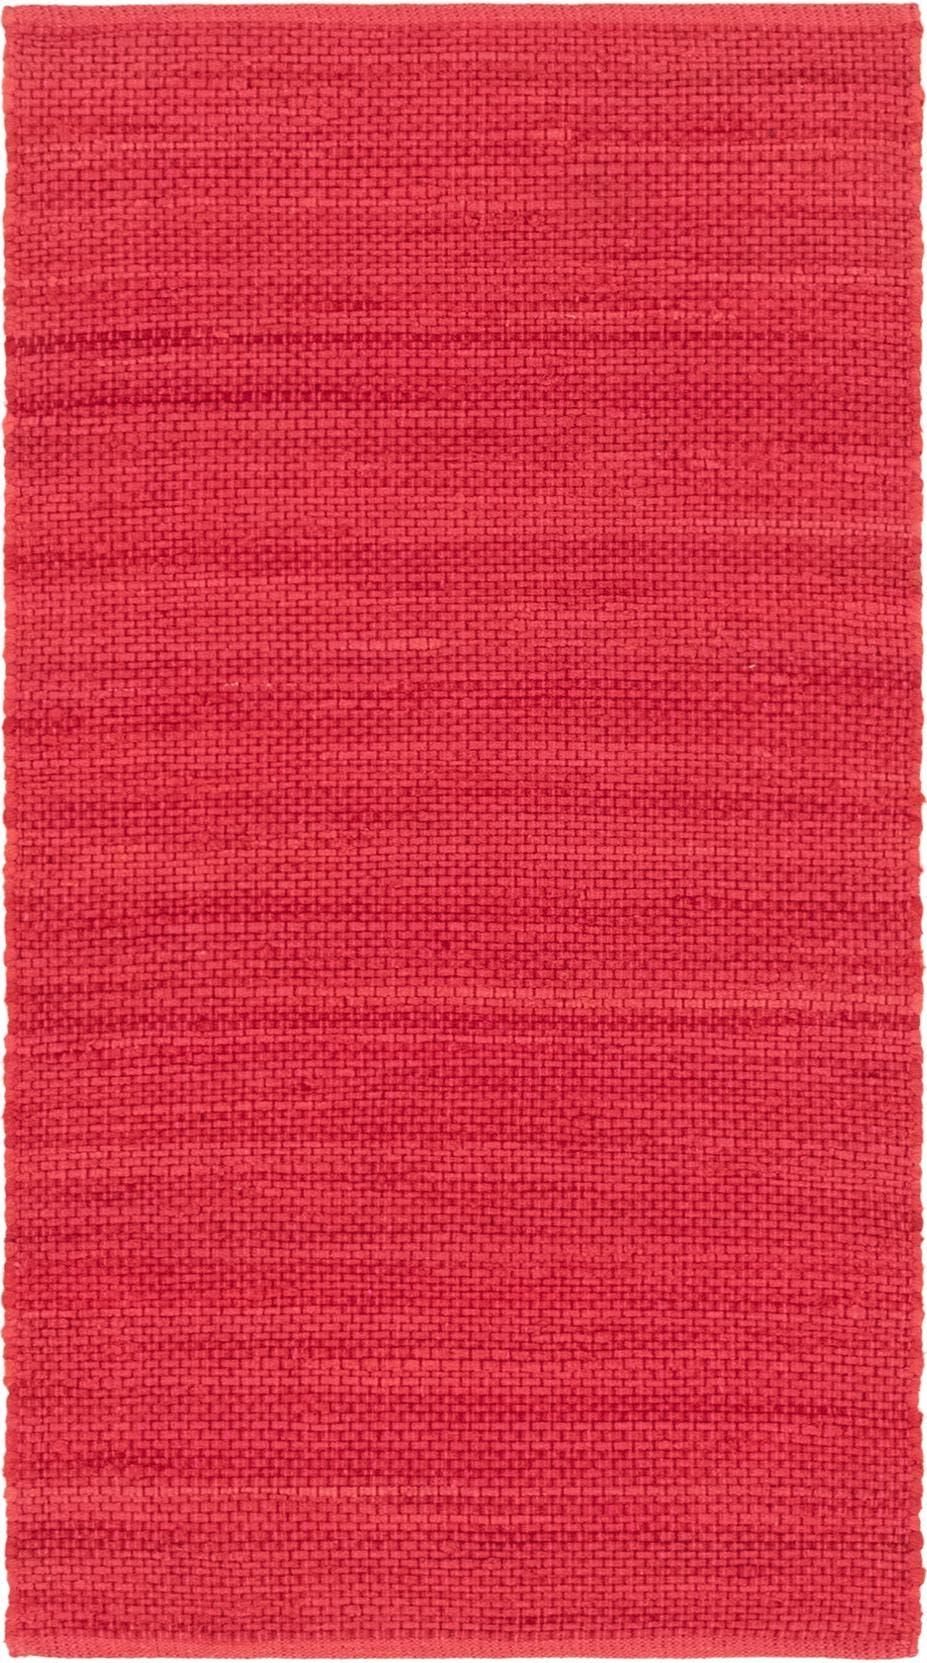 2' 8 x 5' Chindi Cotton Rug main image